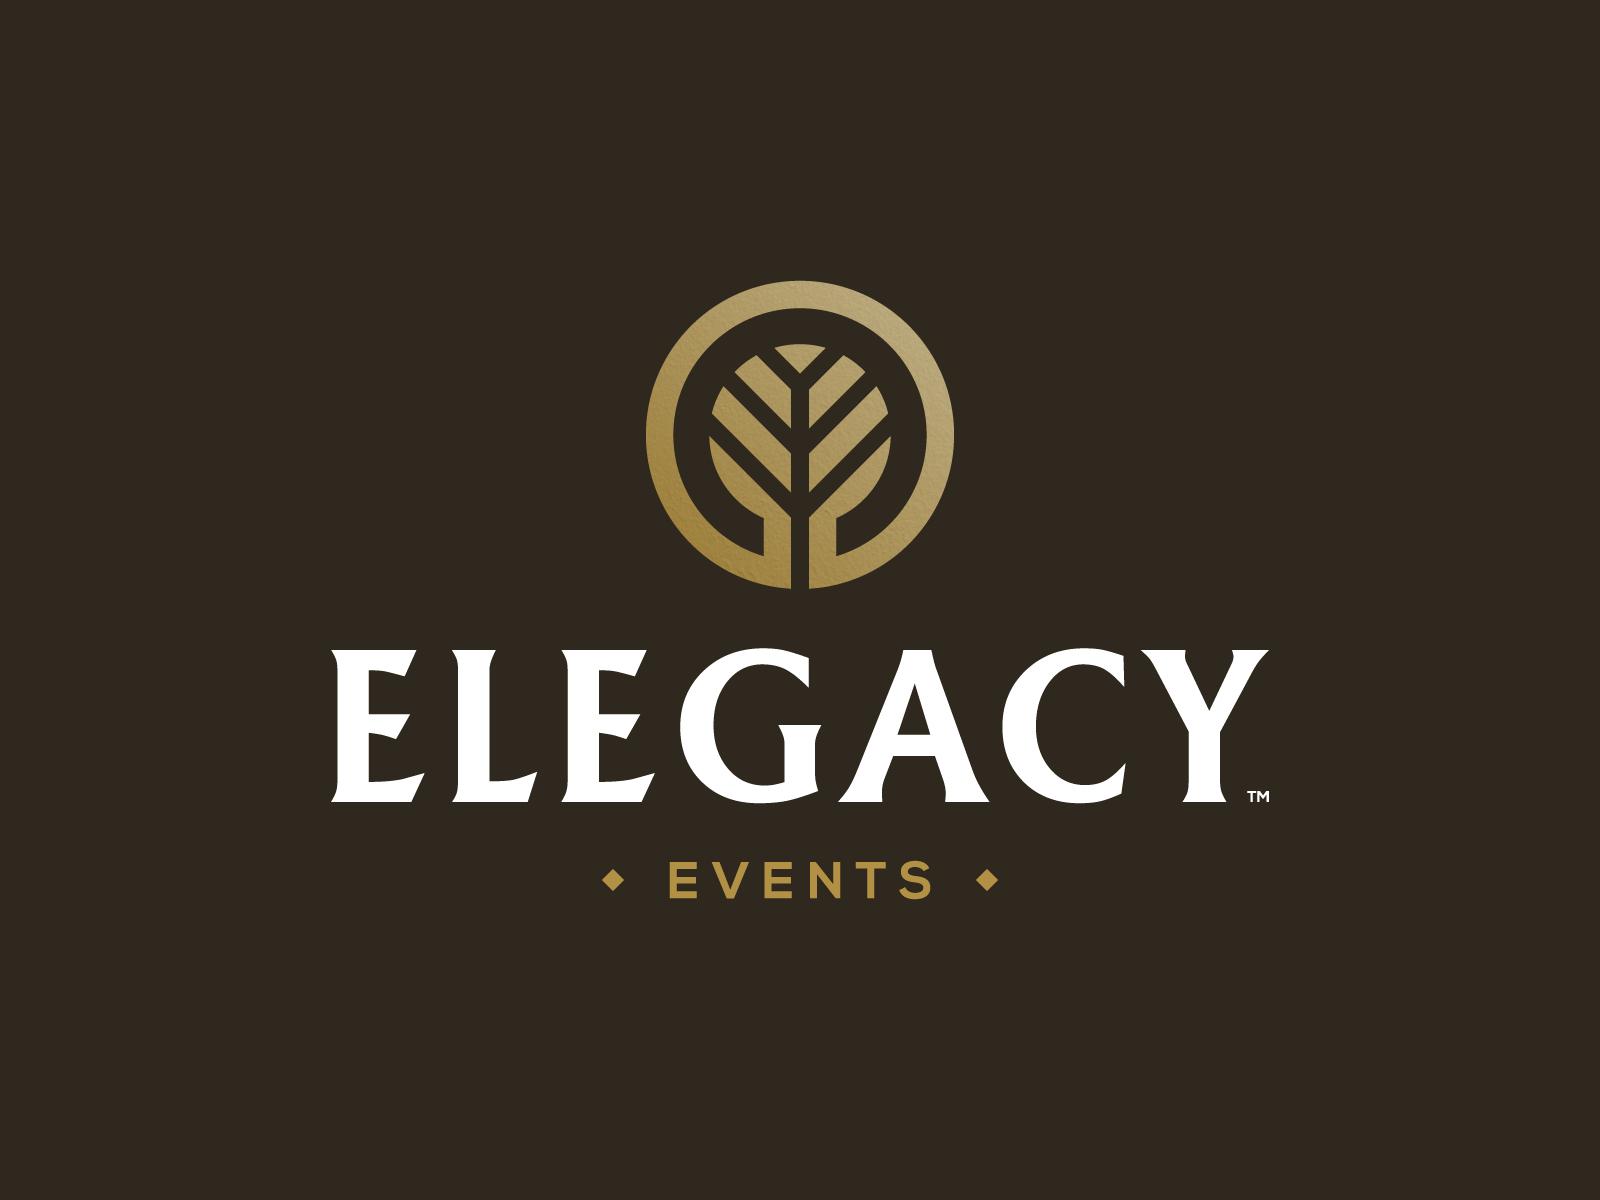 Elegacy events   logo design